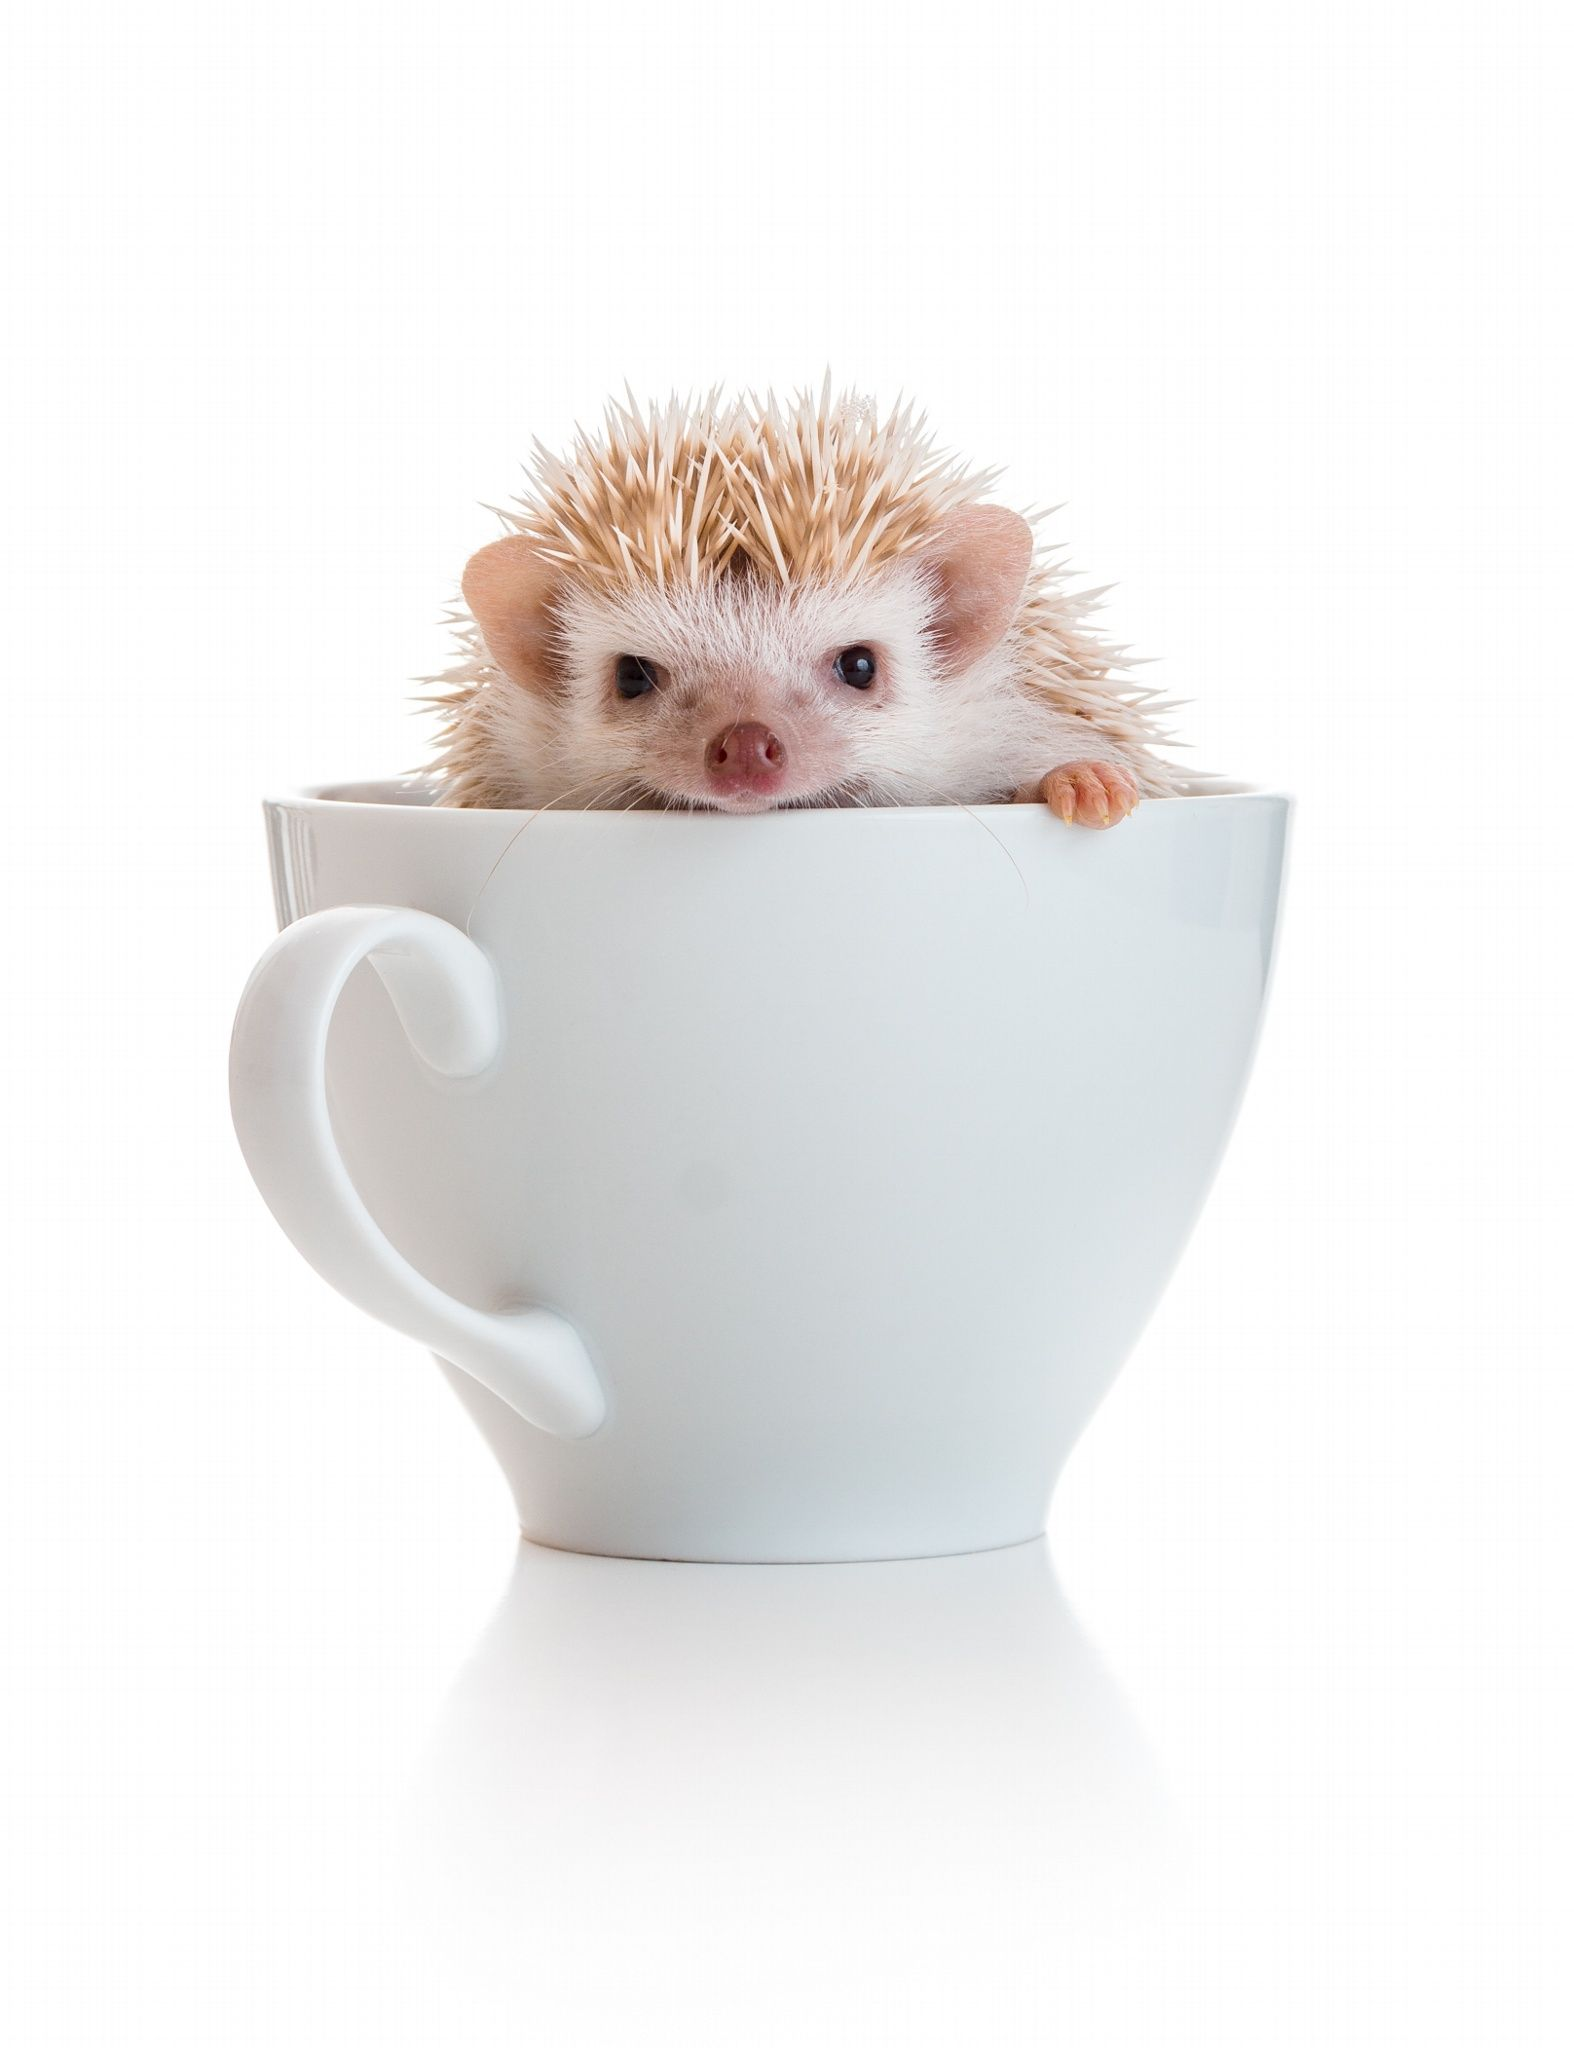 Photo Liam Neeson The Pygmy Hedgehog by Aron  Durkin on 500px